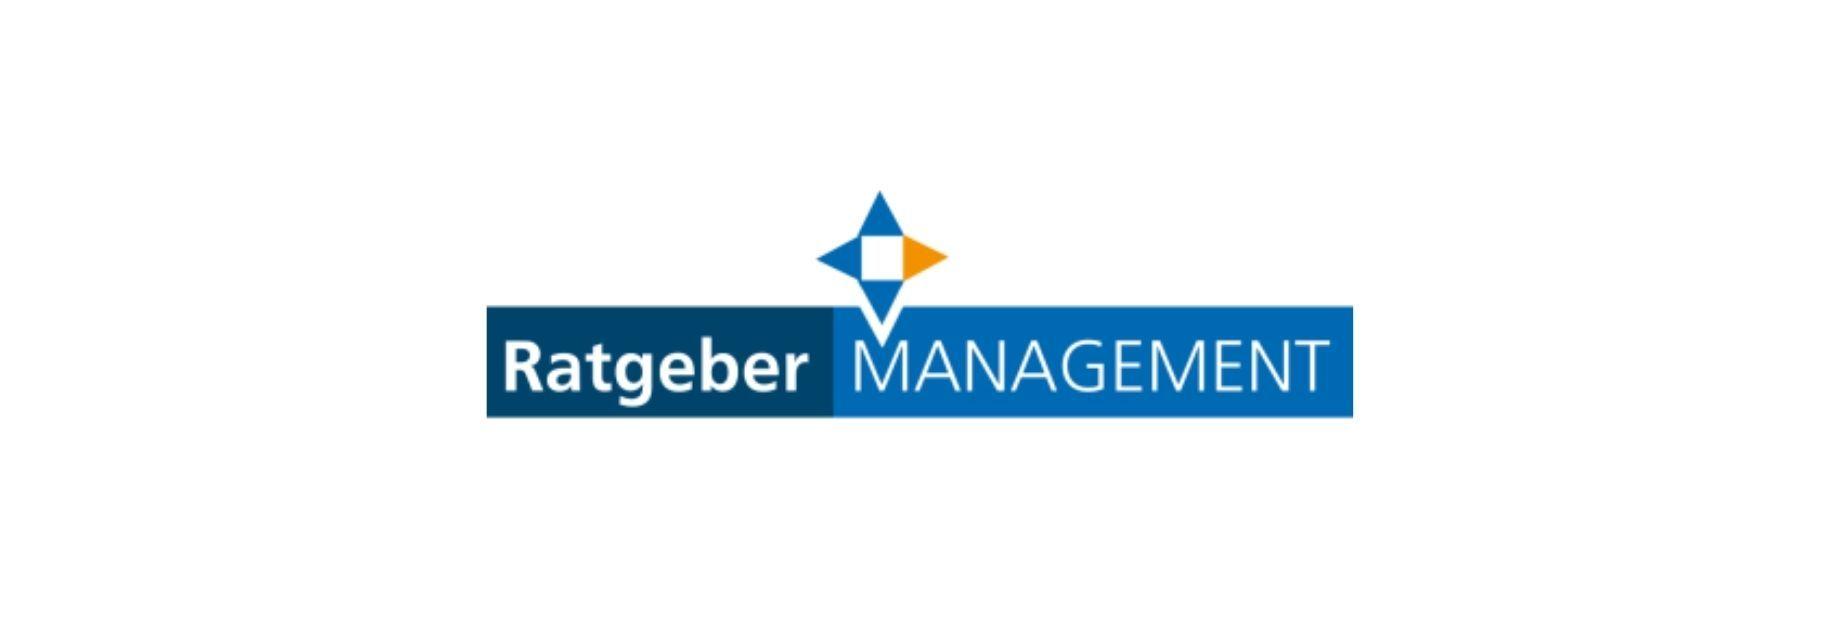 Ratgeber Management